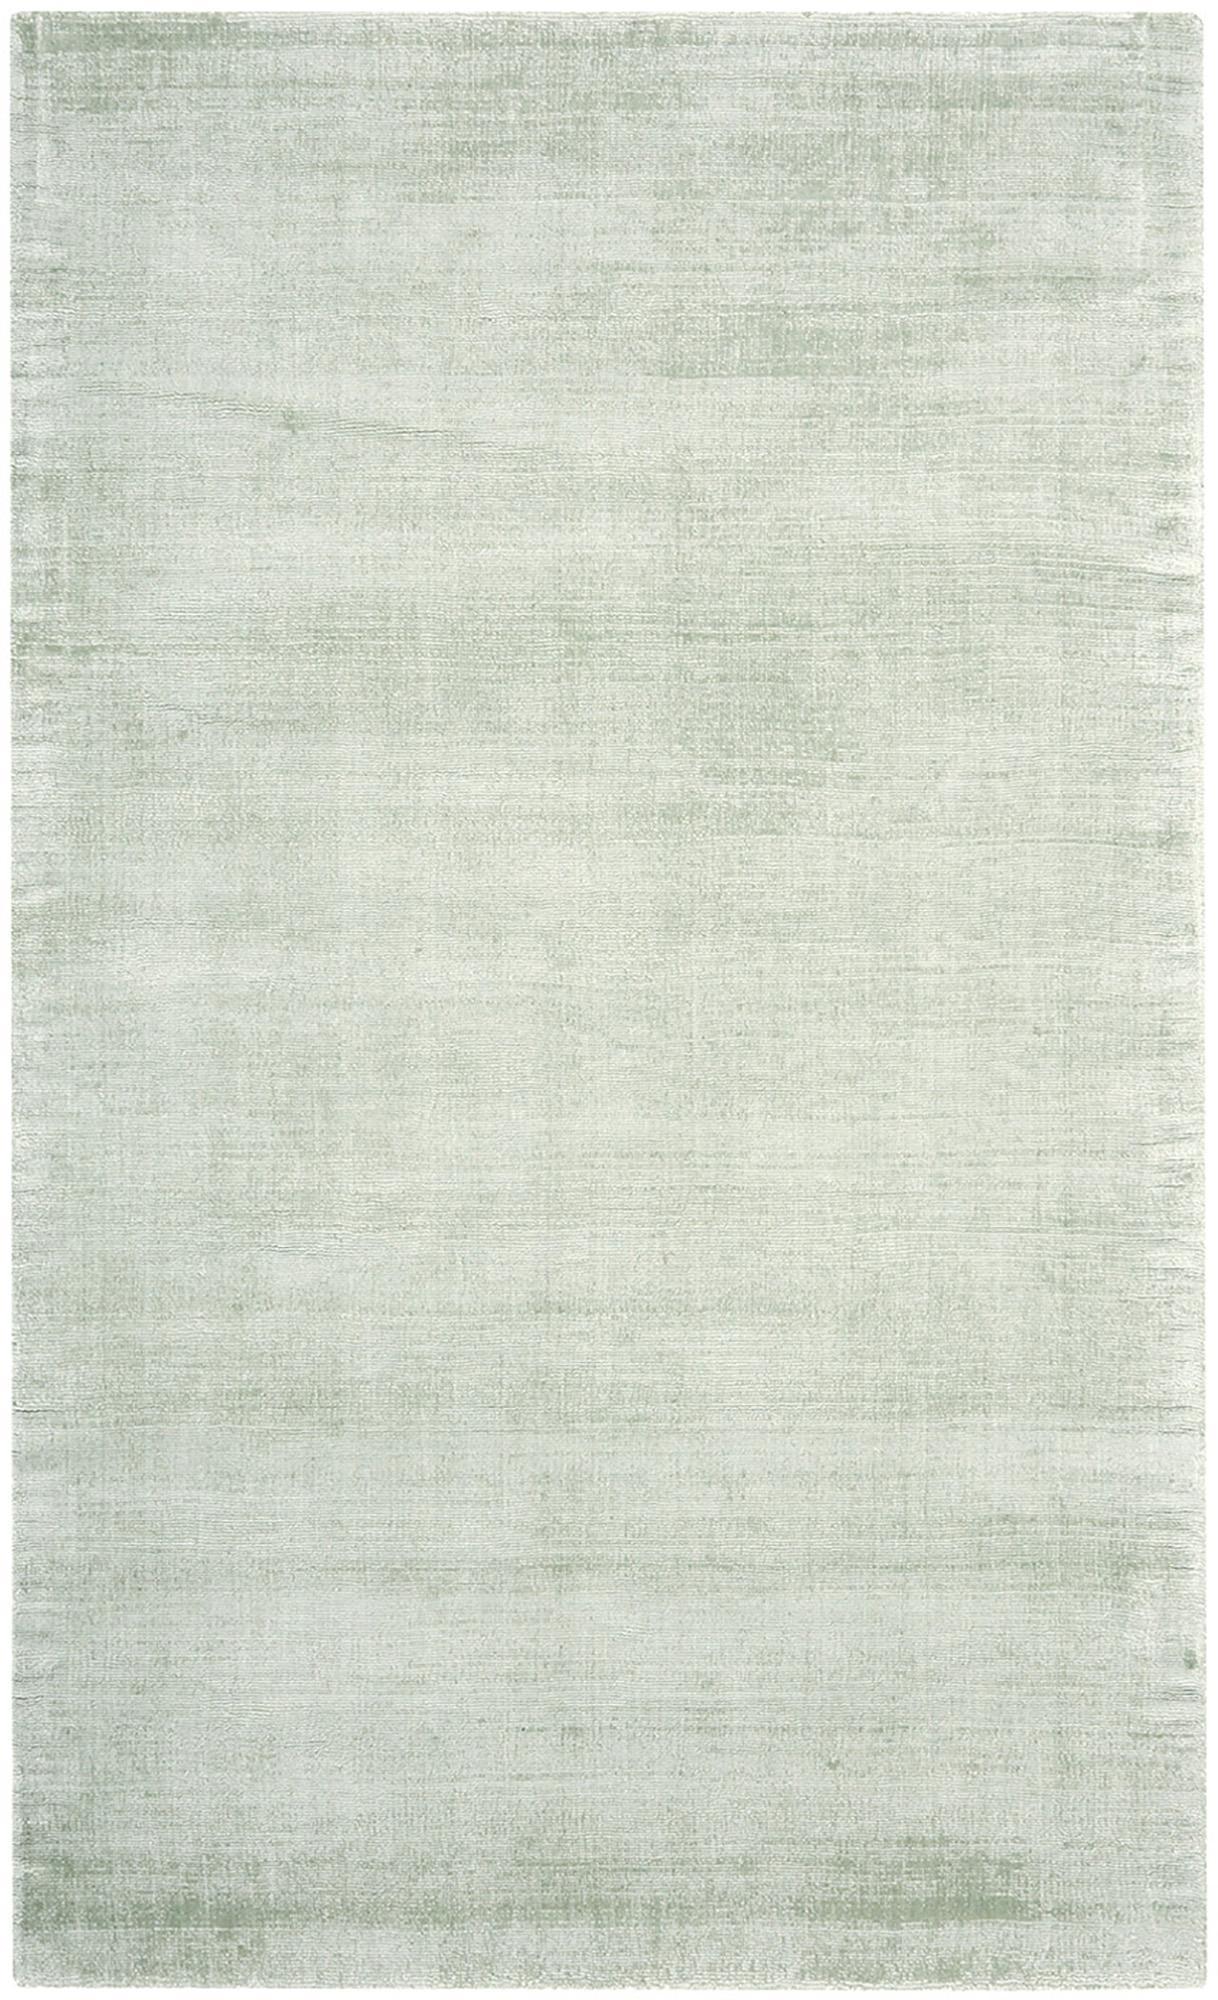 Handgewebter Viskoseteppich Jane in Lindgrün, Flor: 100% Viskose, Lindgrün, B 90 x L 150 cm (Größe XS)